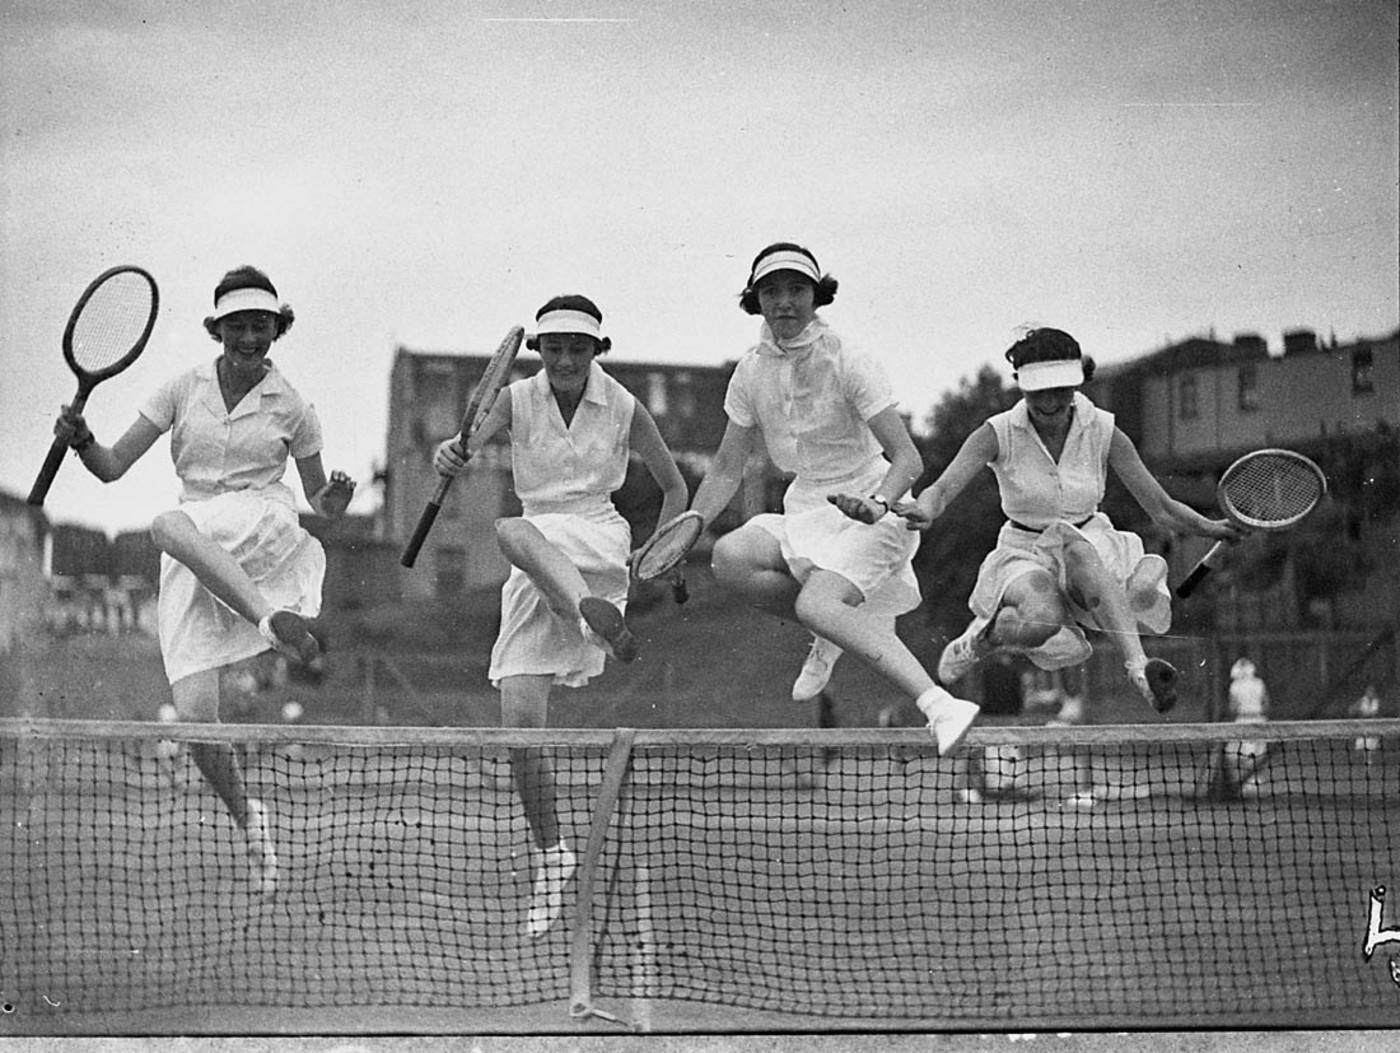 Country Week tennis, 5/1/1937, photograph by Sam Hood